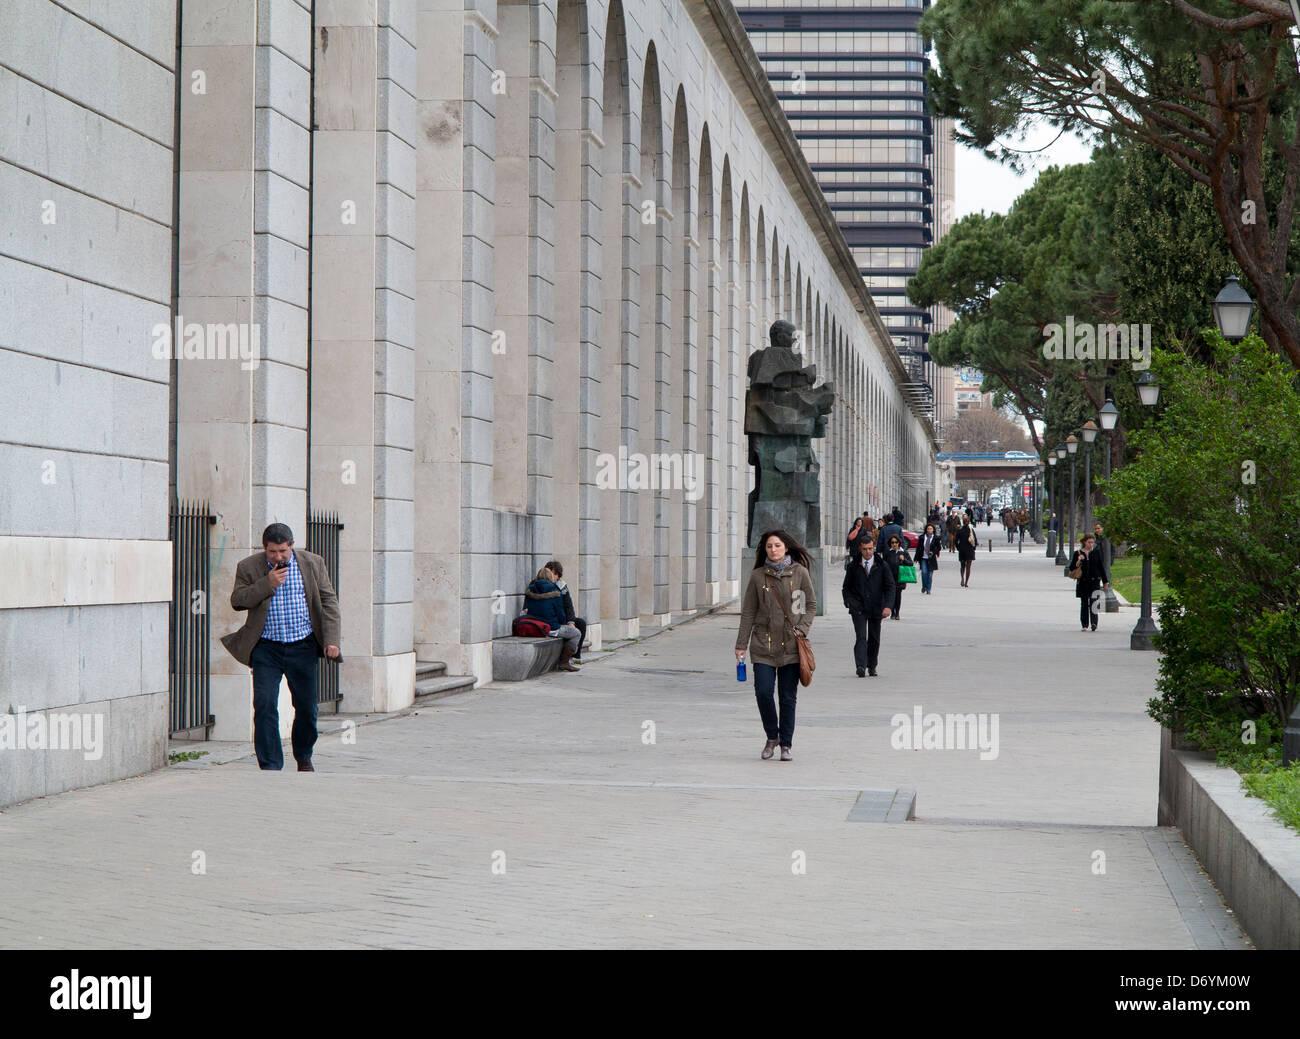 Paseo de la Castellana, at the government buildings of Nuevos Ministerios, Madrid, Spain Stock Photo